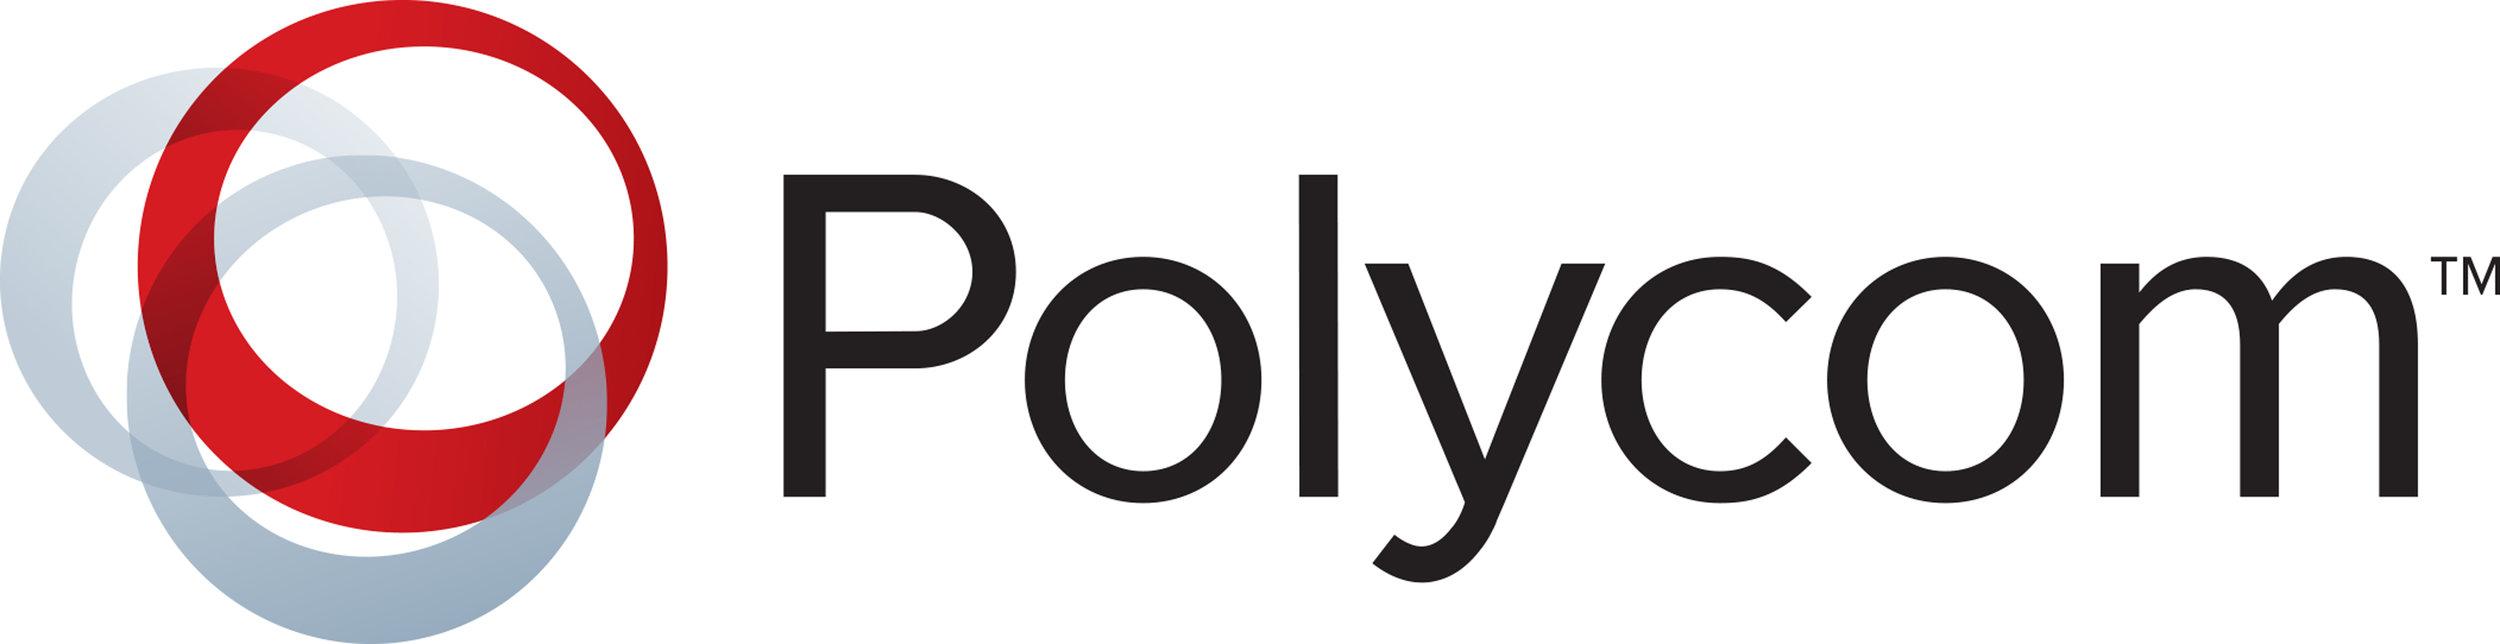 Polycom_CMYK_Logo.jpg